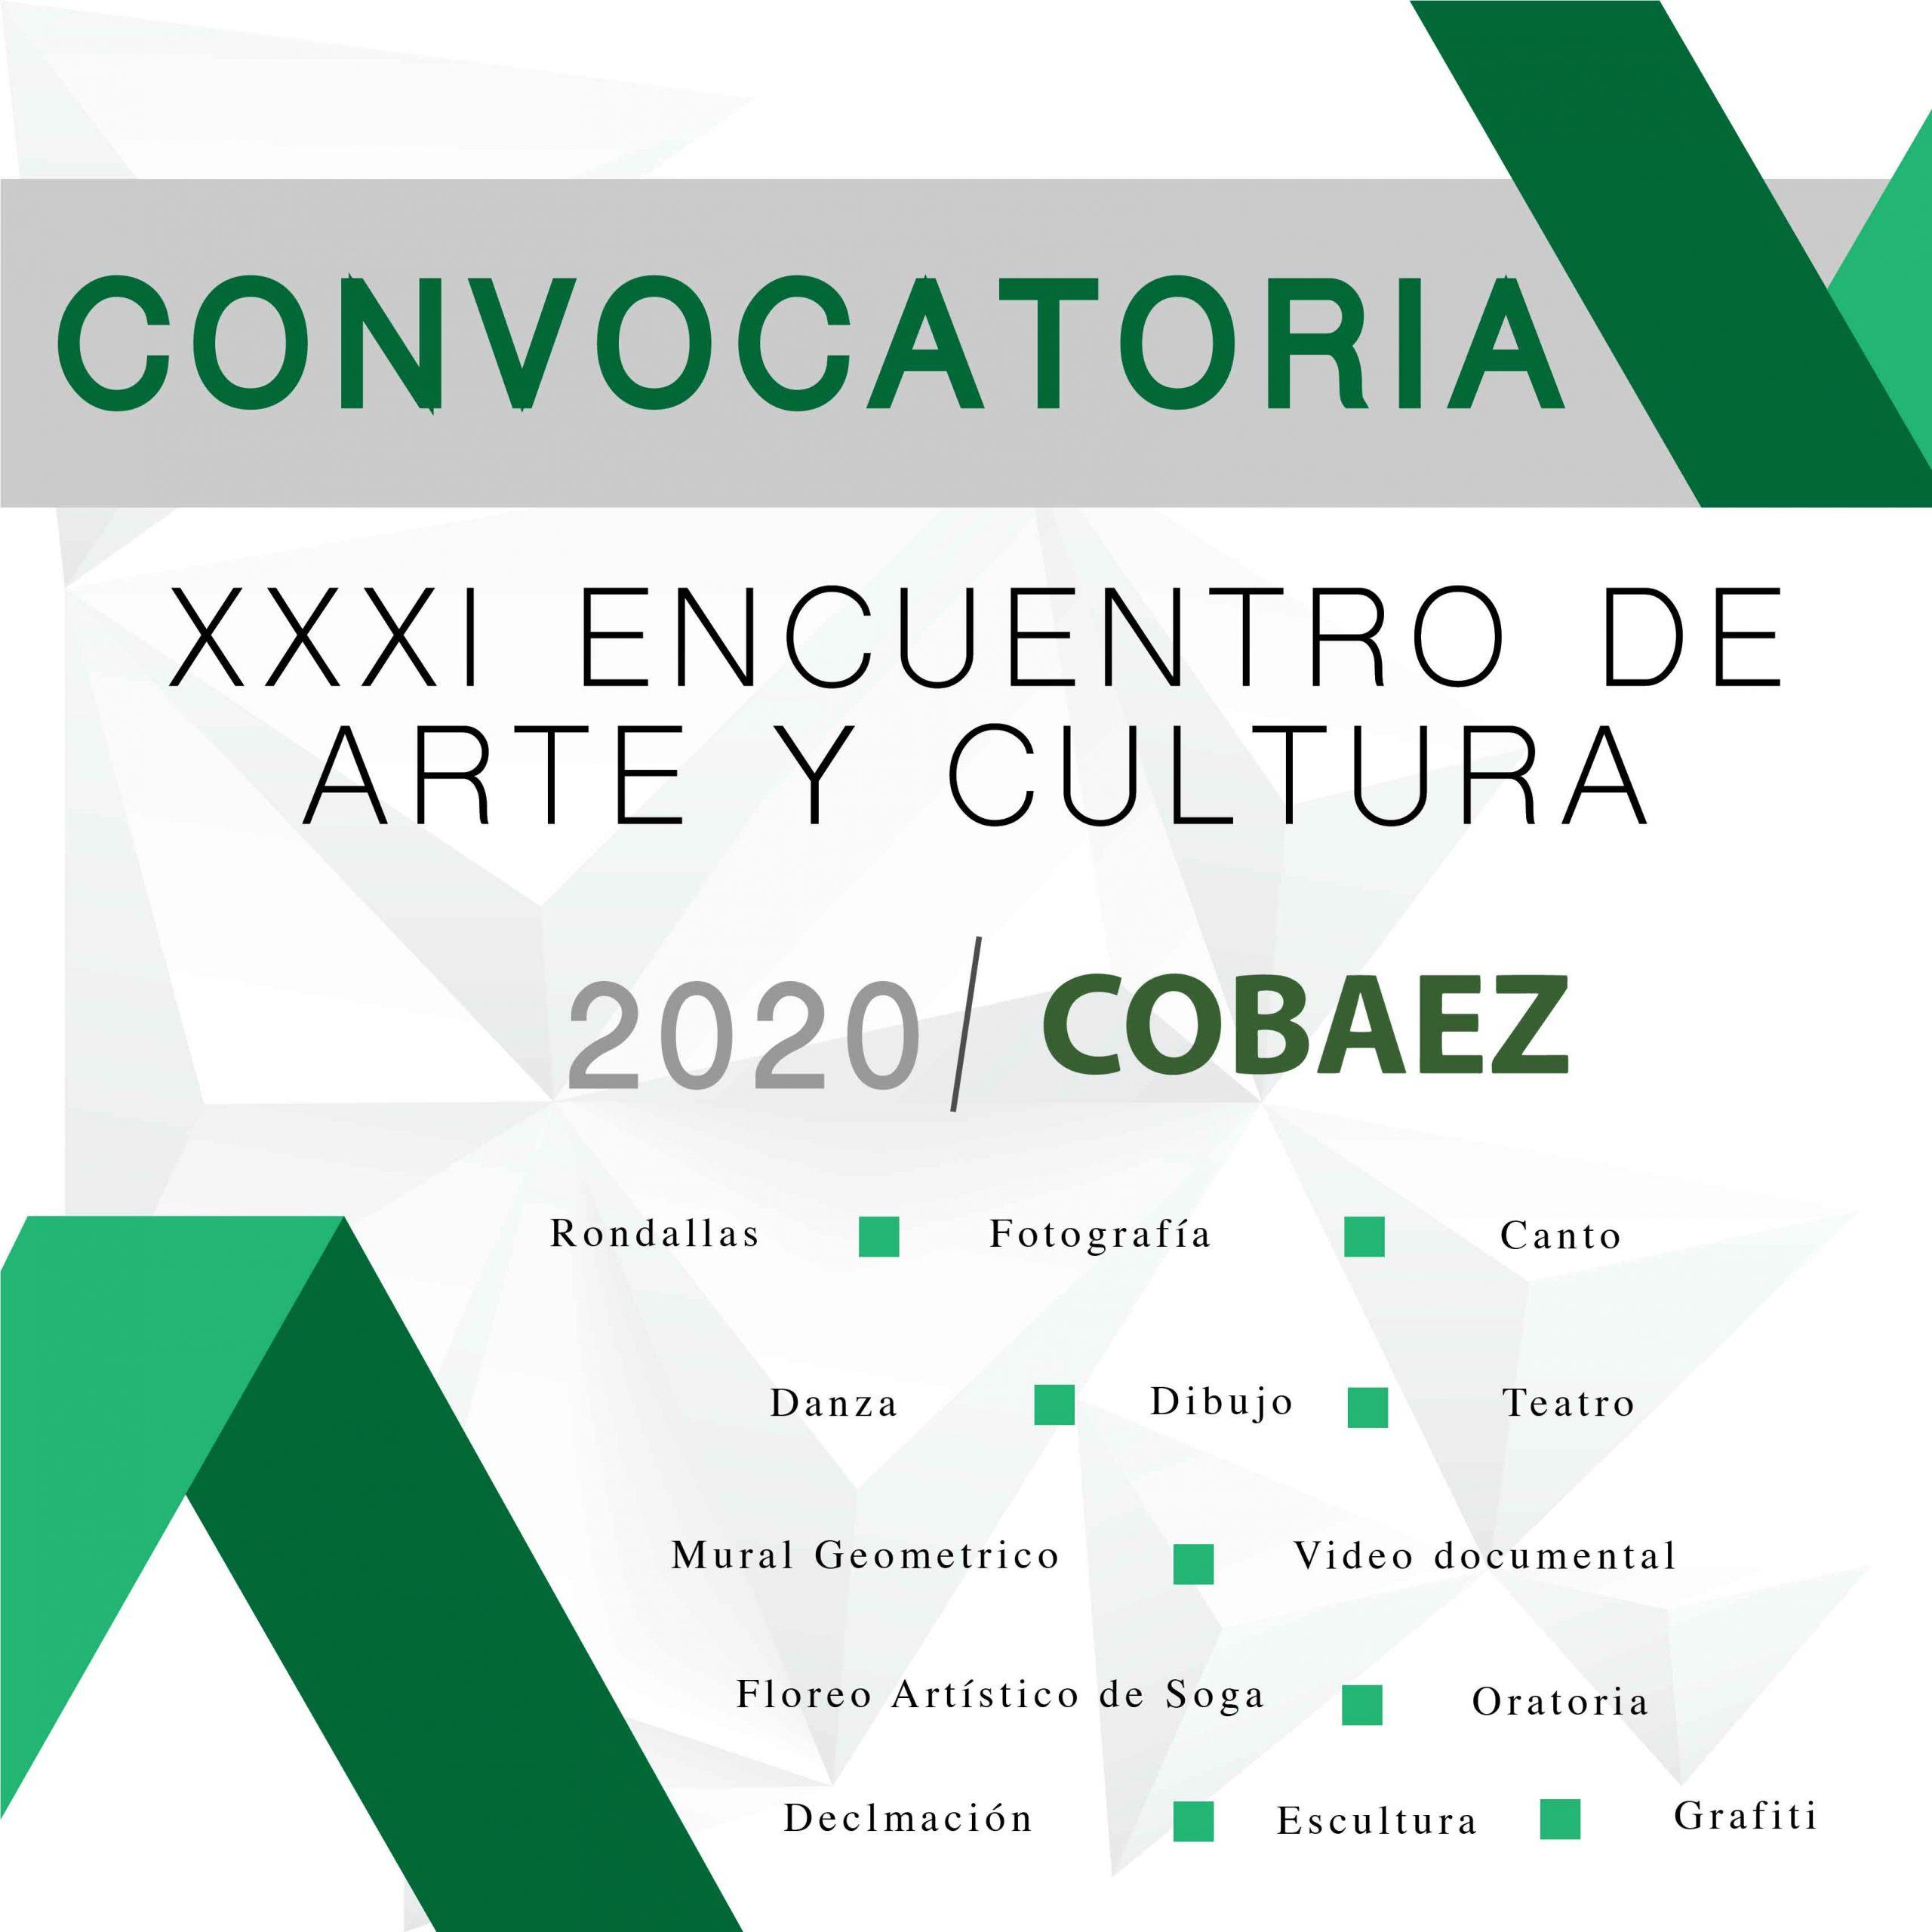 CONVOCATORIA XXXI ENCUENTRO DE ARTE Y CULTURA